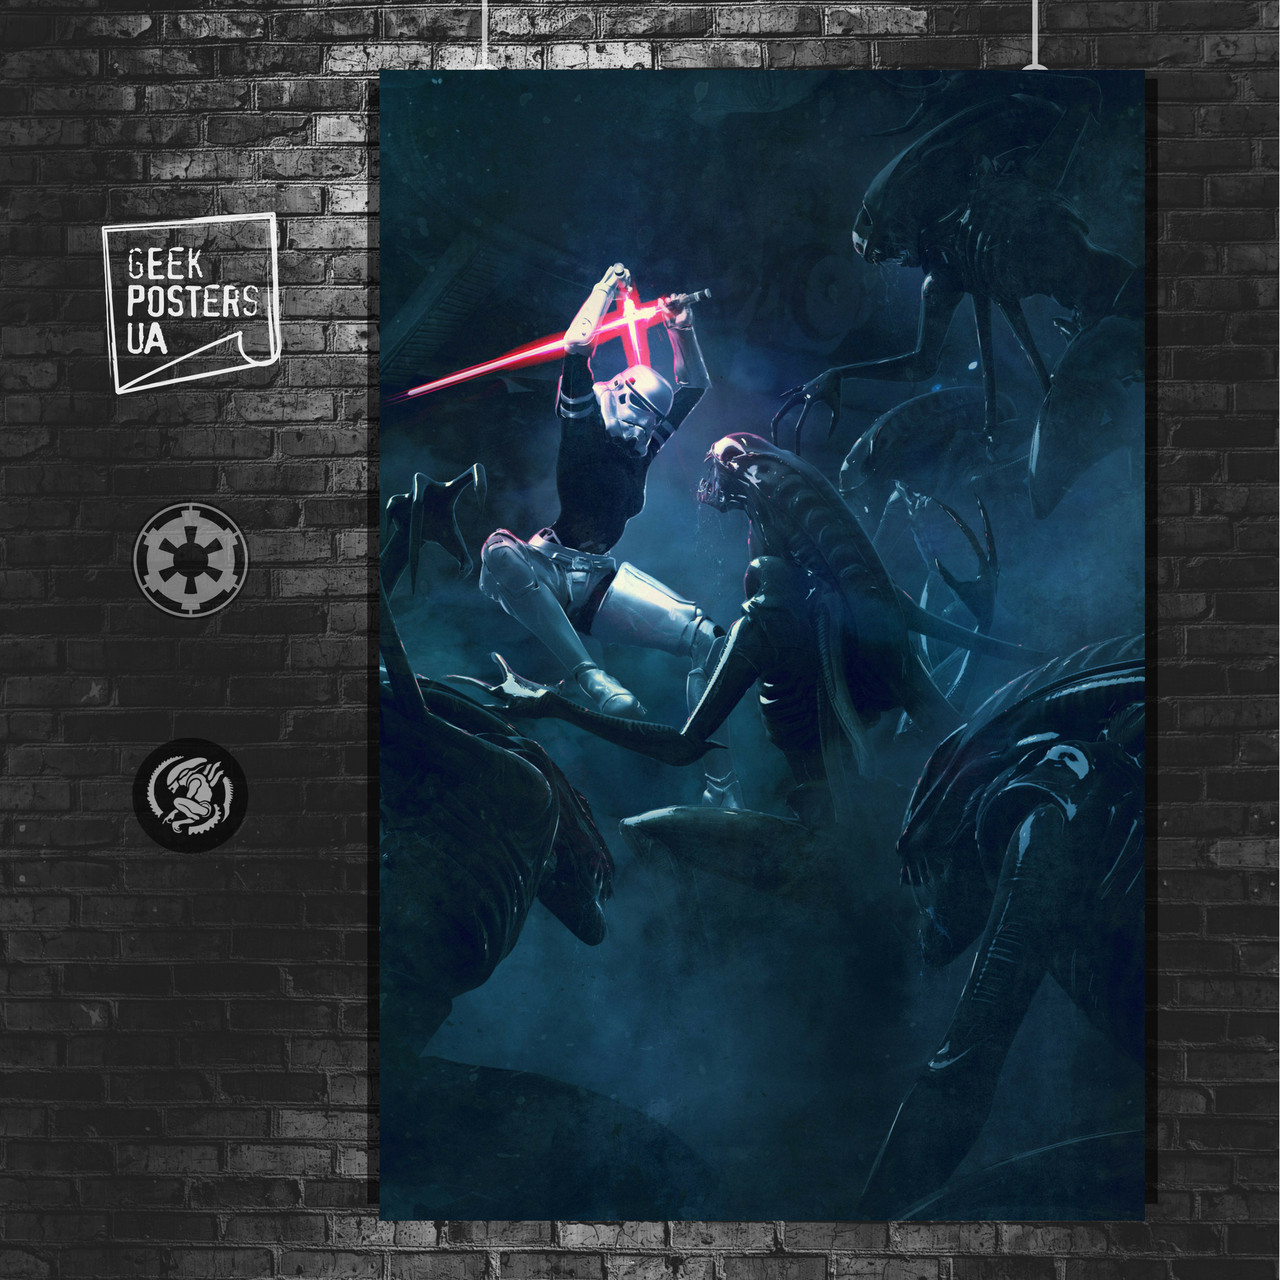 Постер Vader's Fist, штурмовик в прыжке. Размер 60x42см (A2). Глянцевая бумага